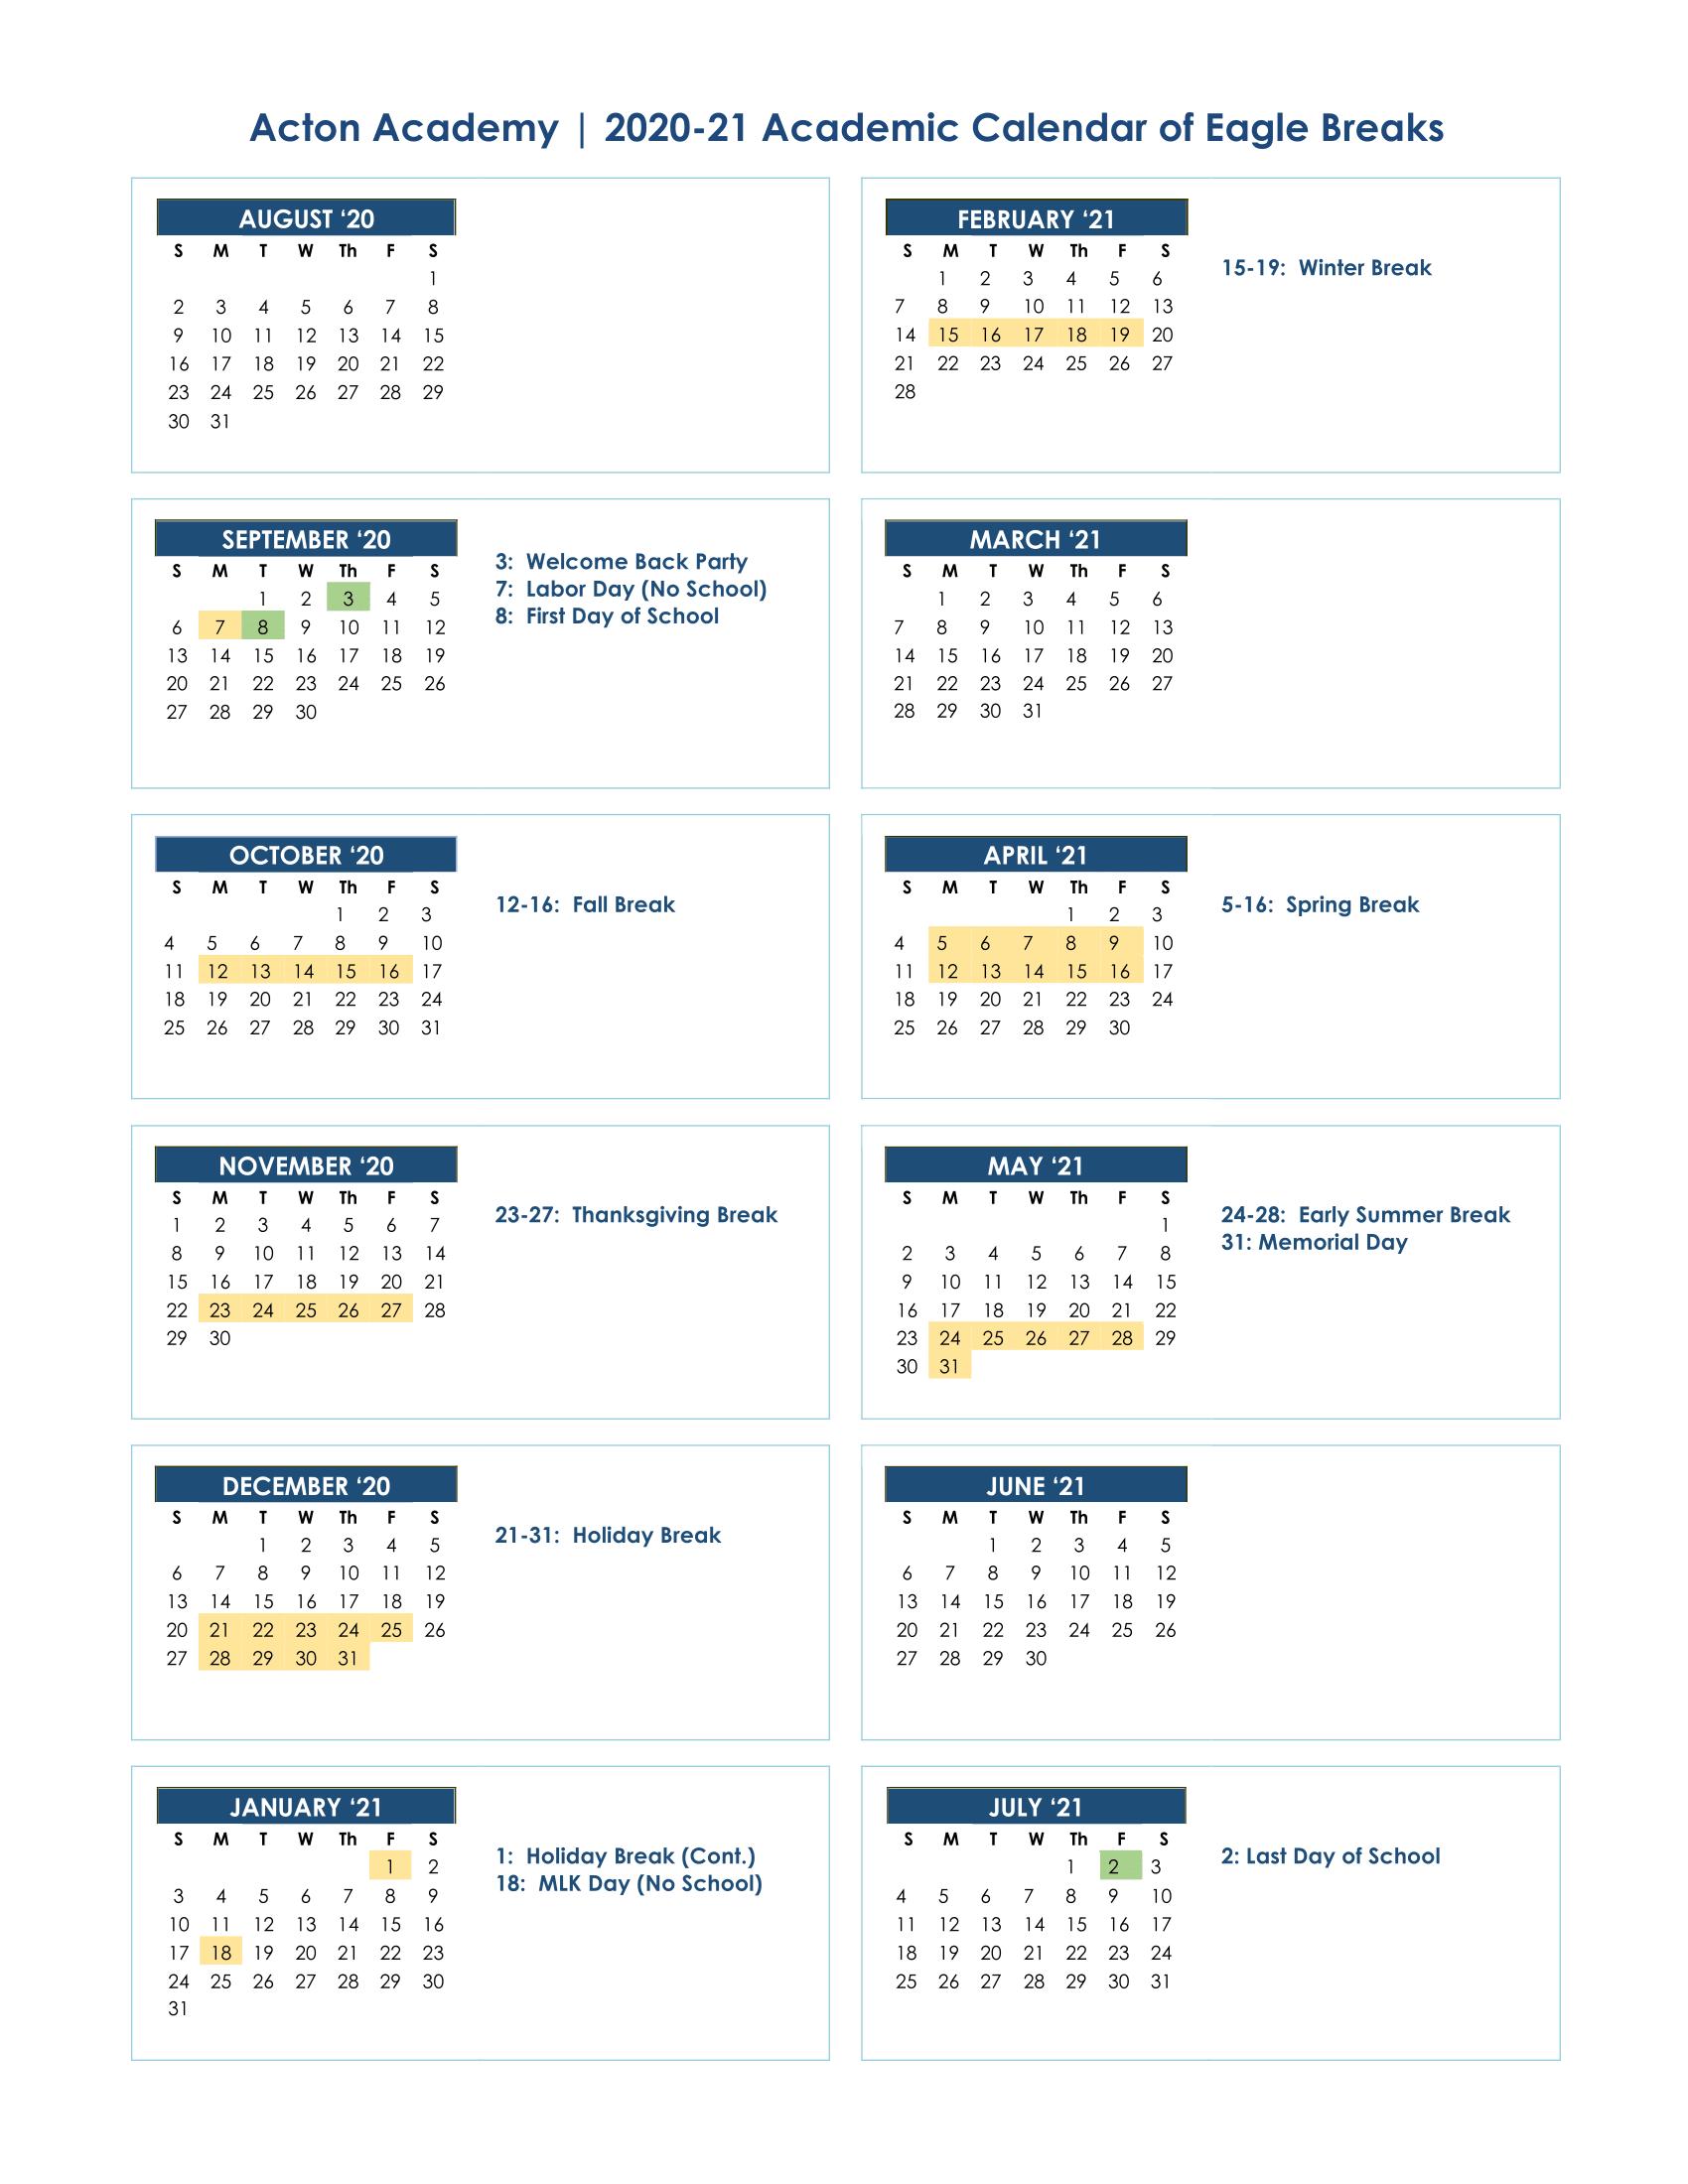 Acton Academy Waco - School Calendar 2020-2021